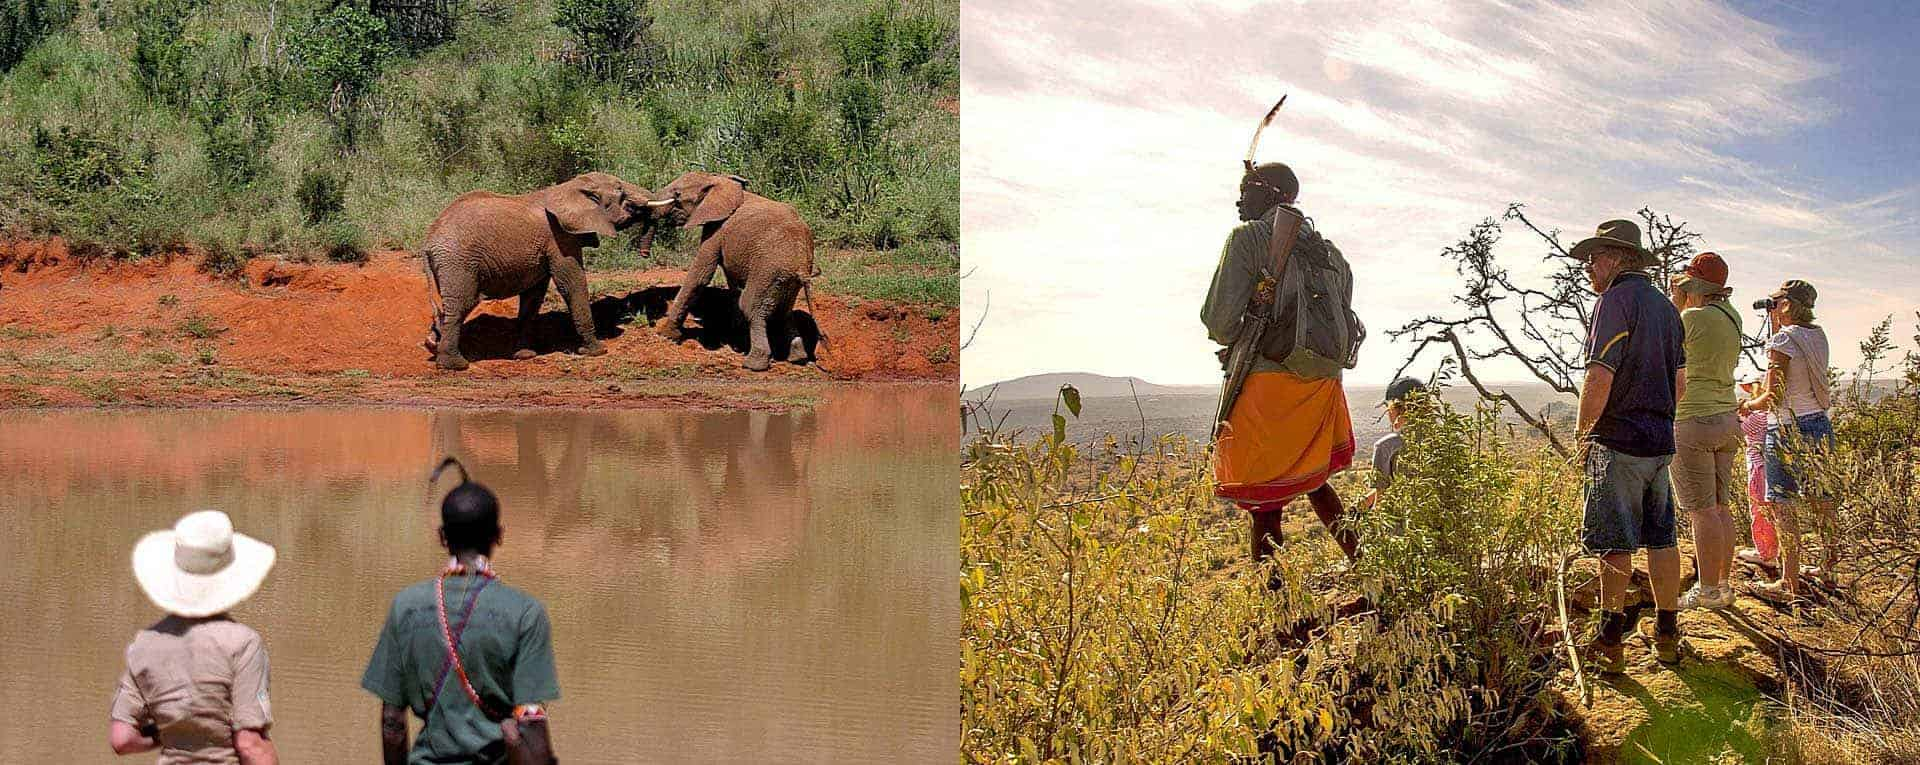 Safari Tour Guide Jobs Africa